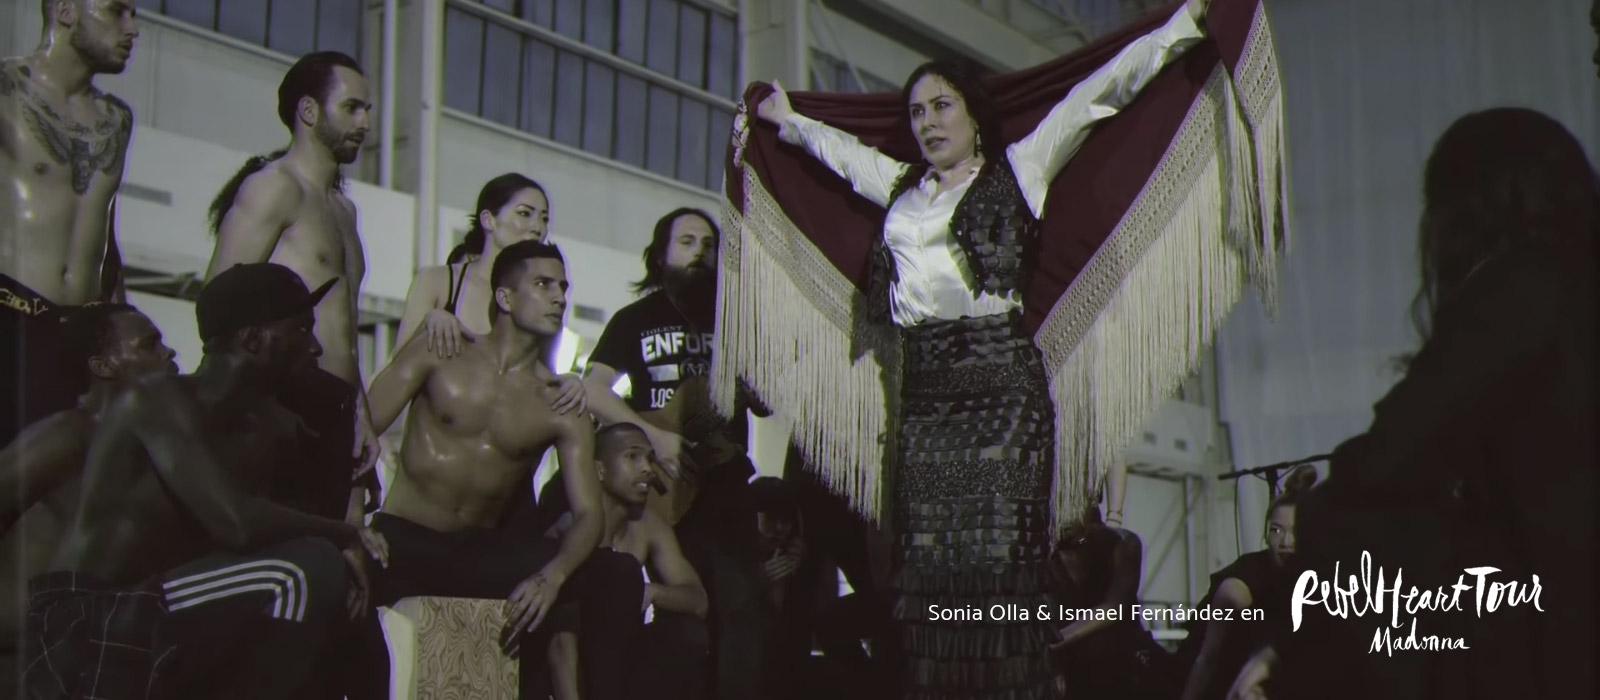 Sonia Olla & Ismael Fenández en Rebel Heart Tour Madonna